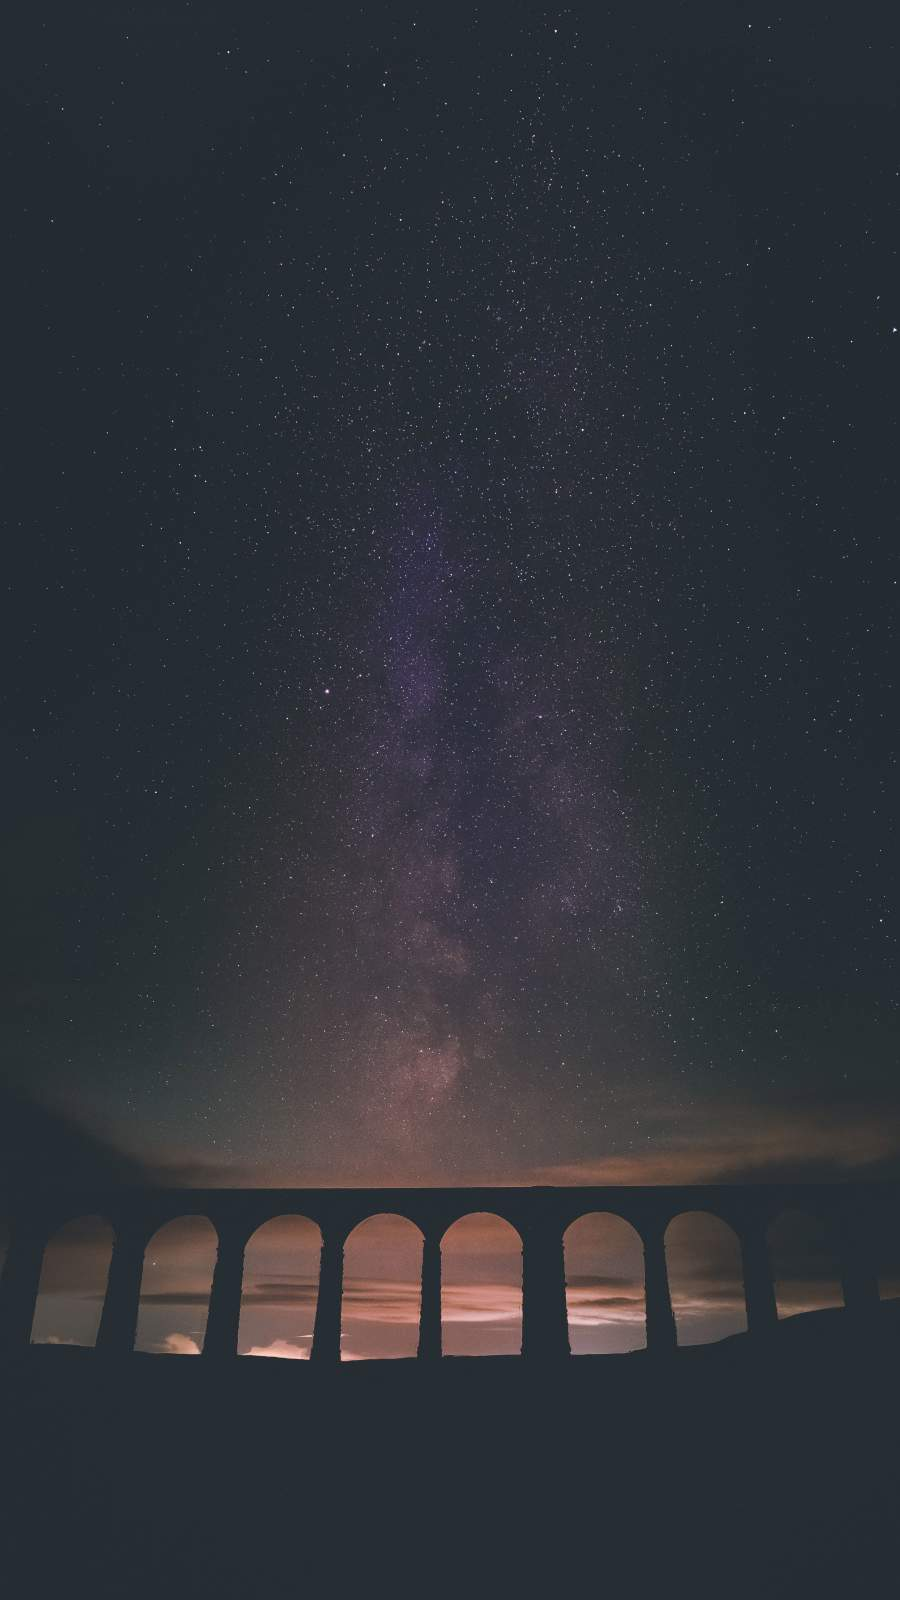 Galaxy View in Night